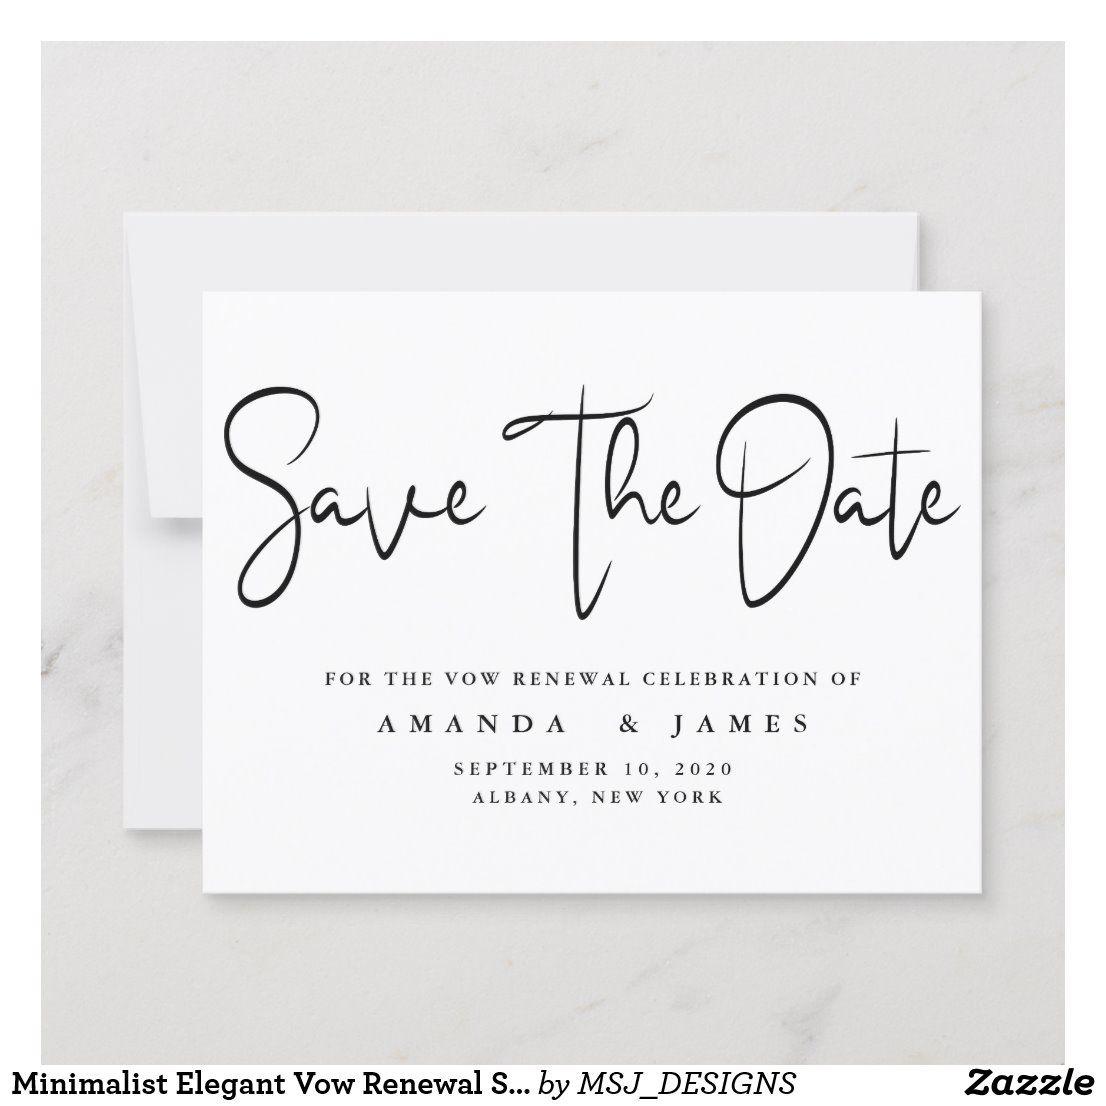 Minimalist Elegant Vow Renewal Save The Date Announcement Zazzle Com Save The Date Vows Vow Renewal